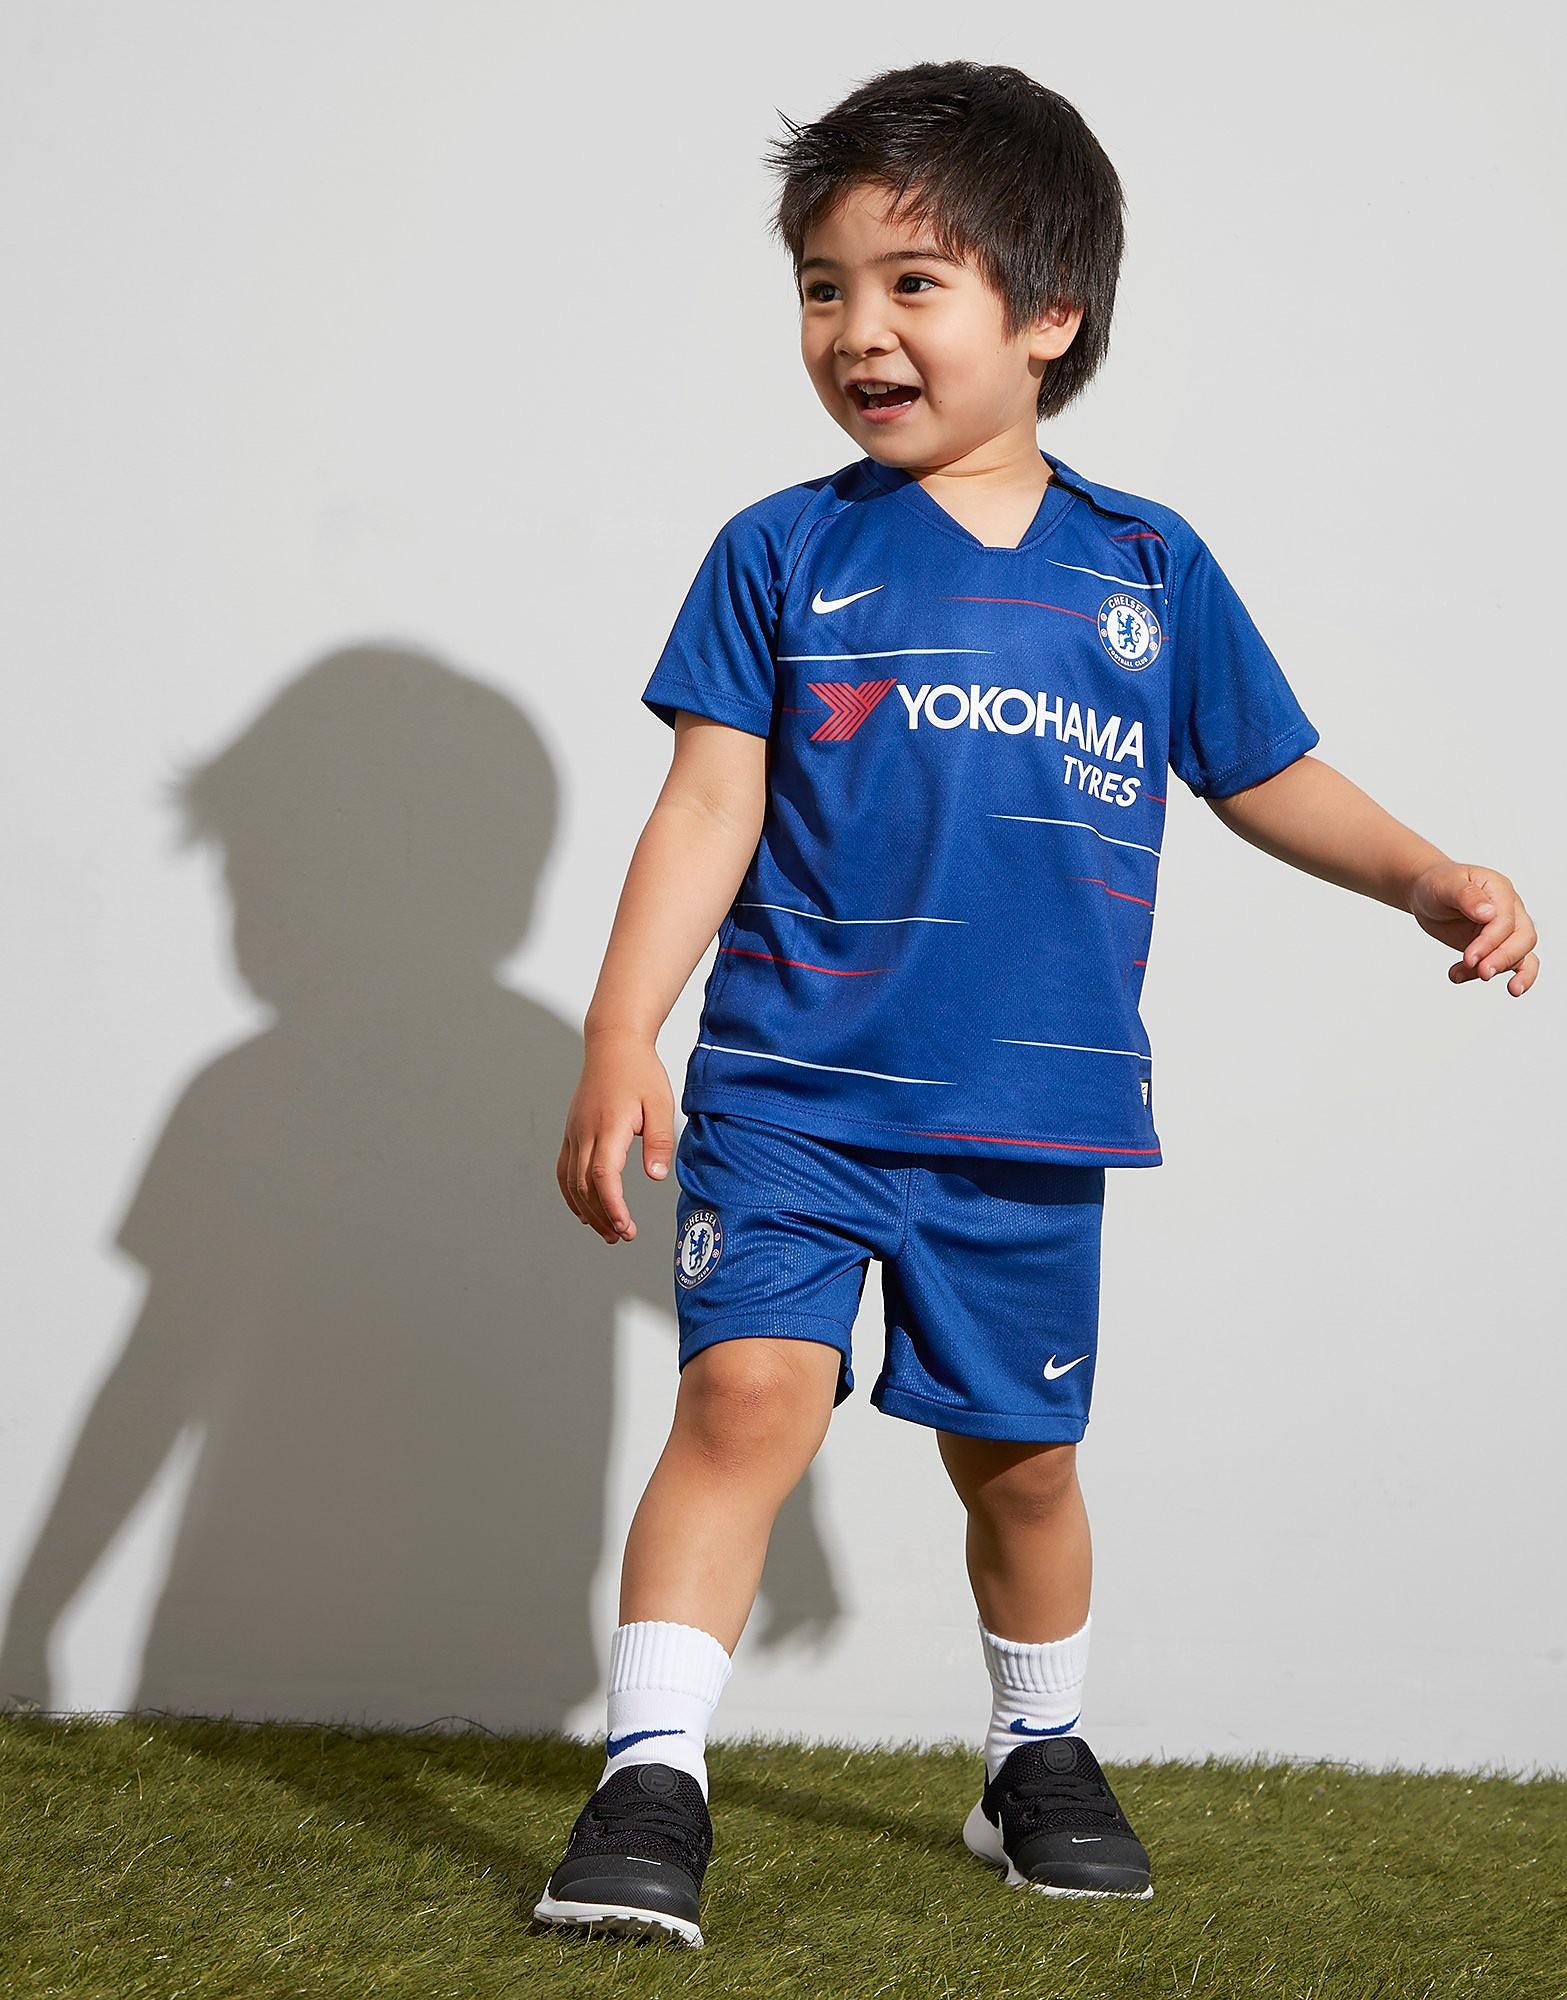 Nike Chelsea FC 2018/19 Hjemmesæt Baby FORUDBESTILLES